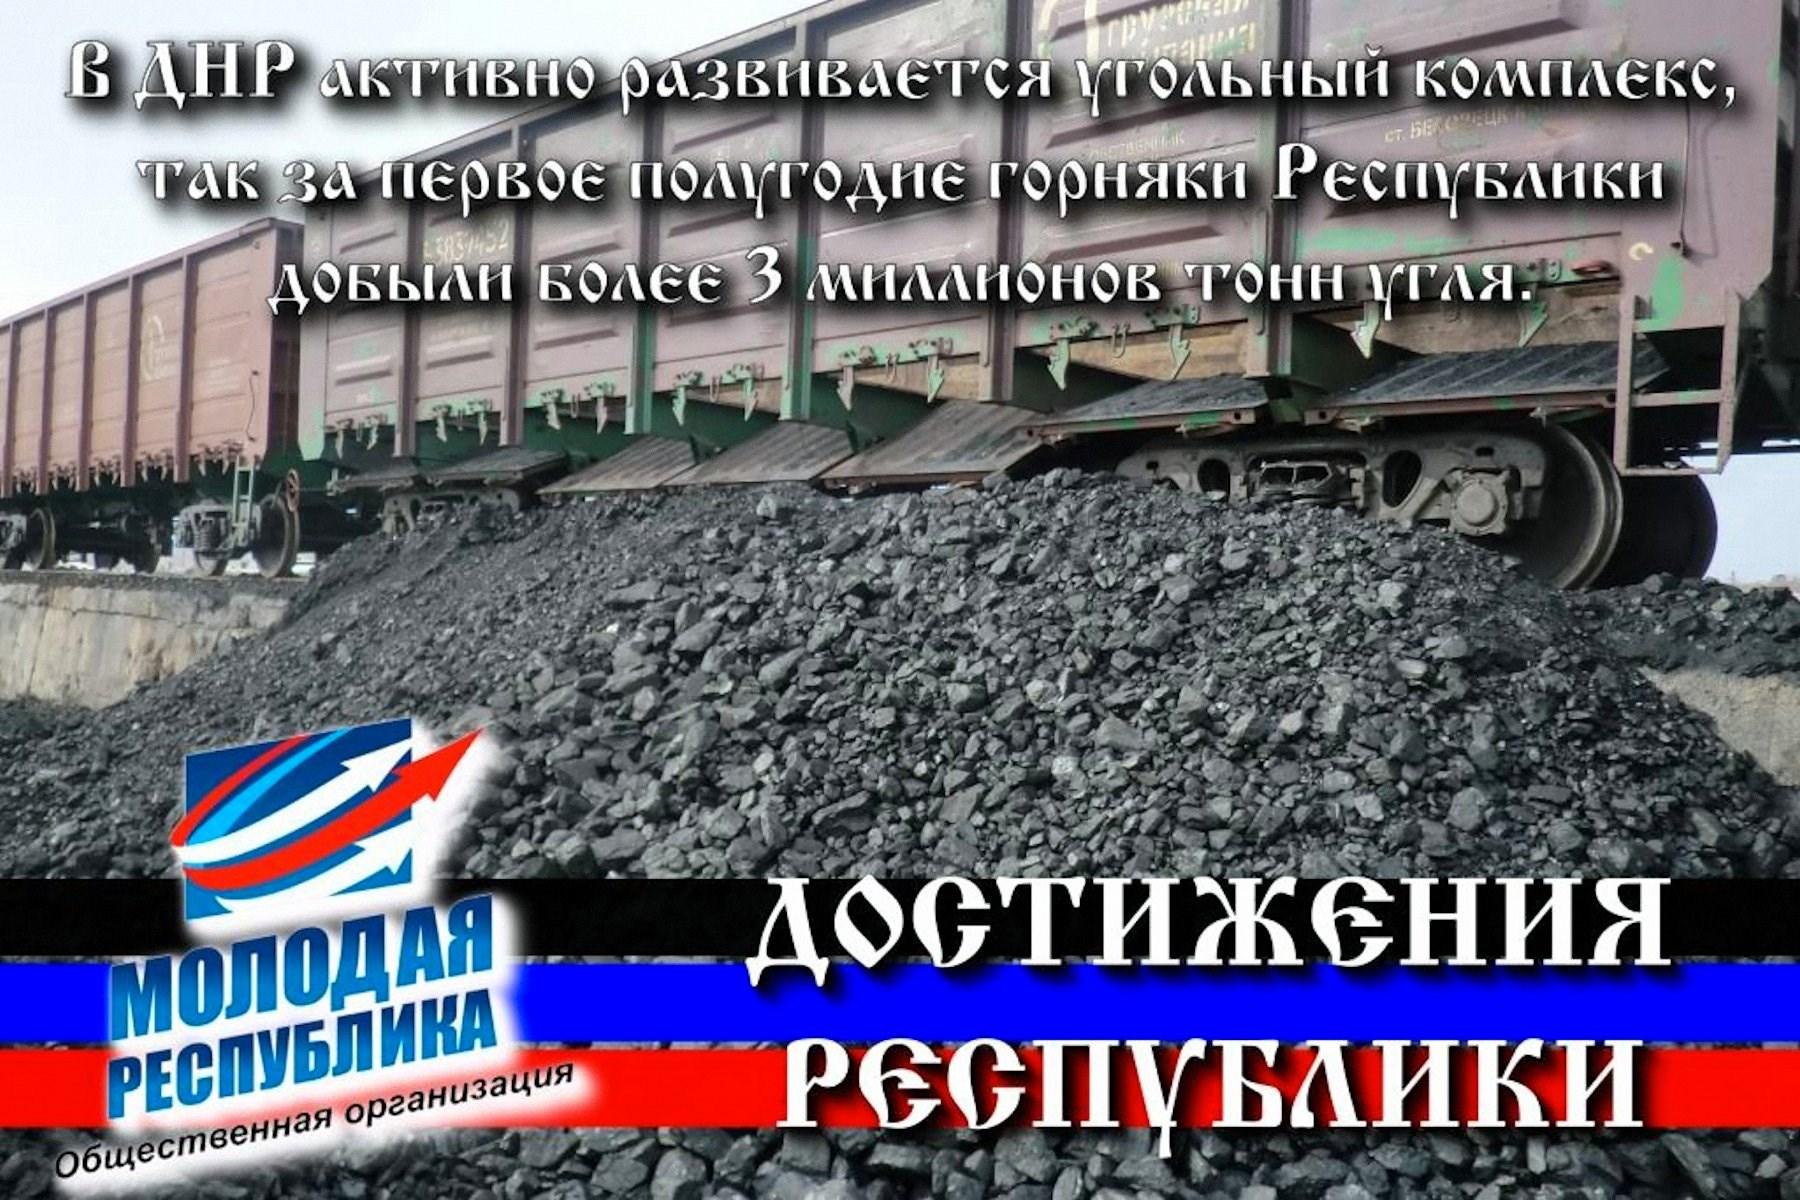 00 property of the republic dnr donetsk pr 06 280815